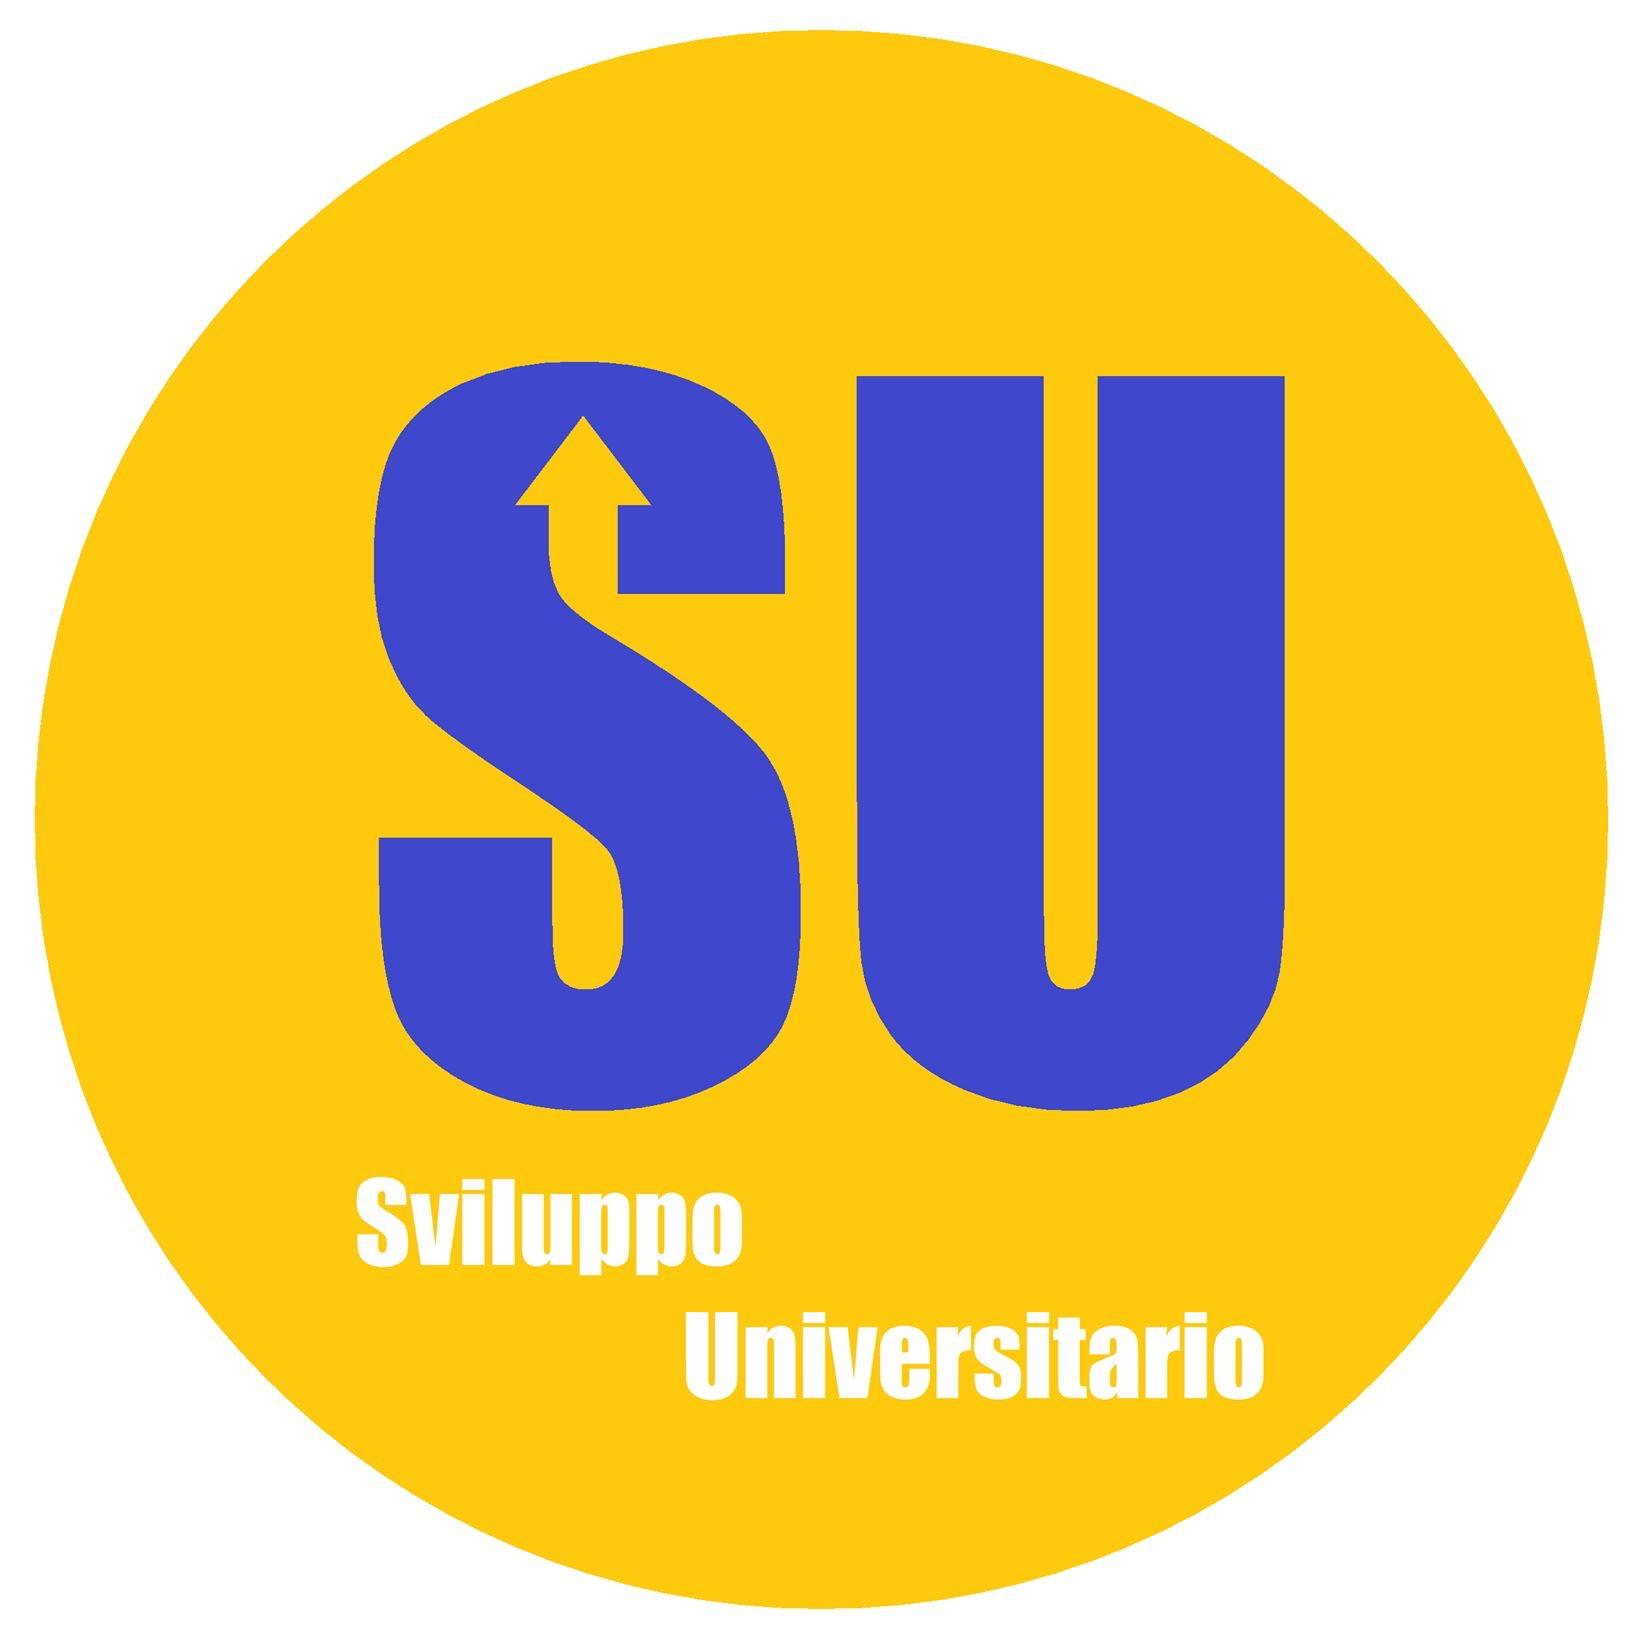 sviluppo universitario